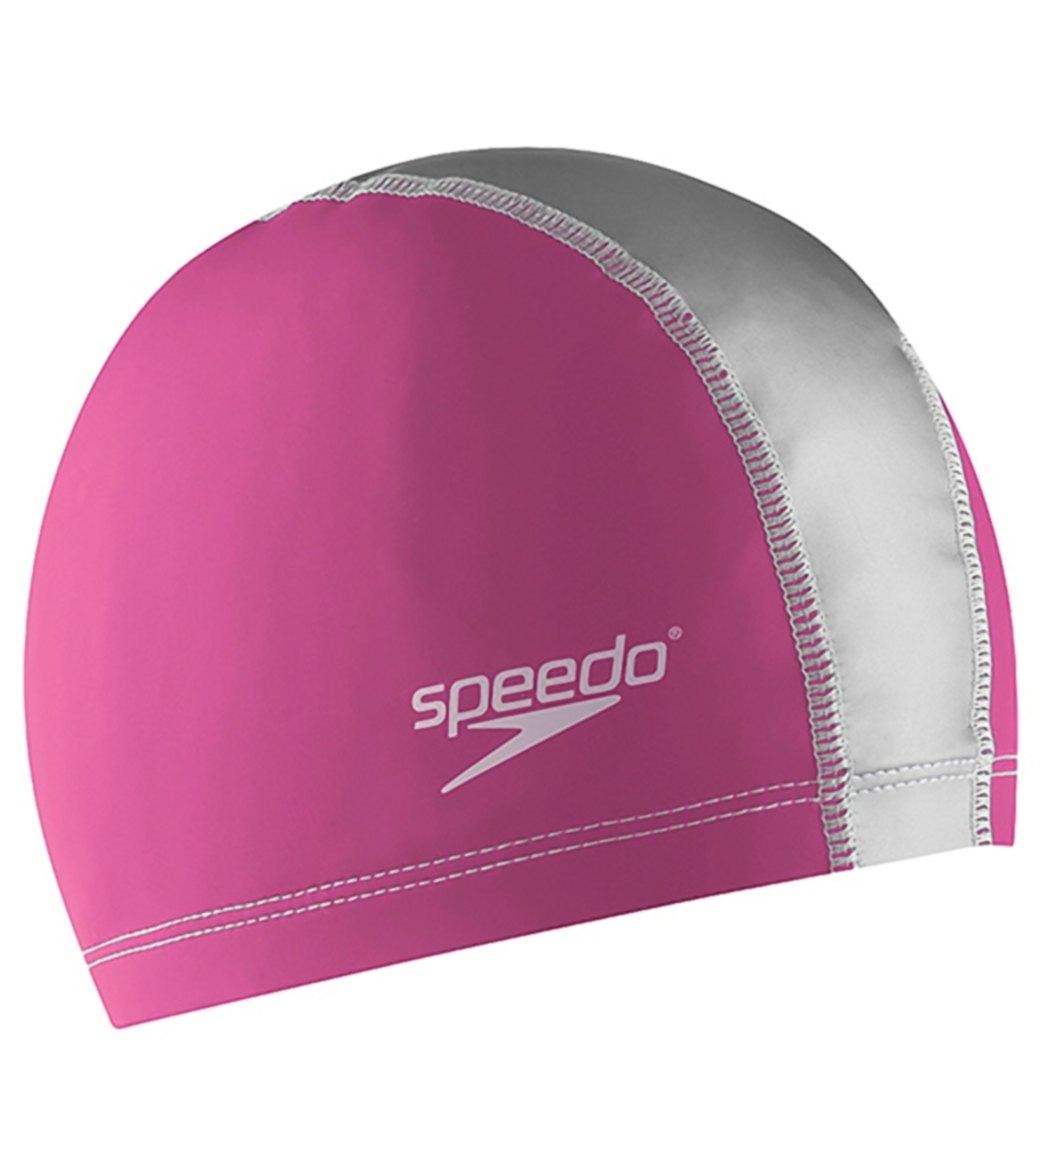 210a4b32885 Speedo Stretch Fit Swim Cap at SwimOutlet.com